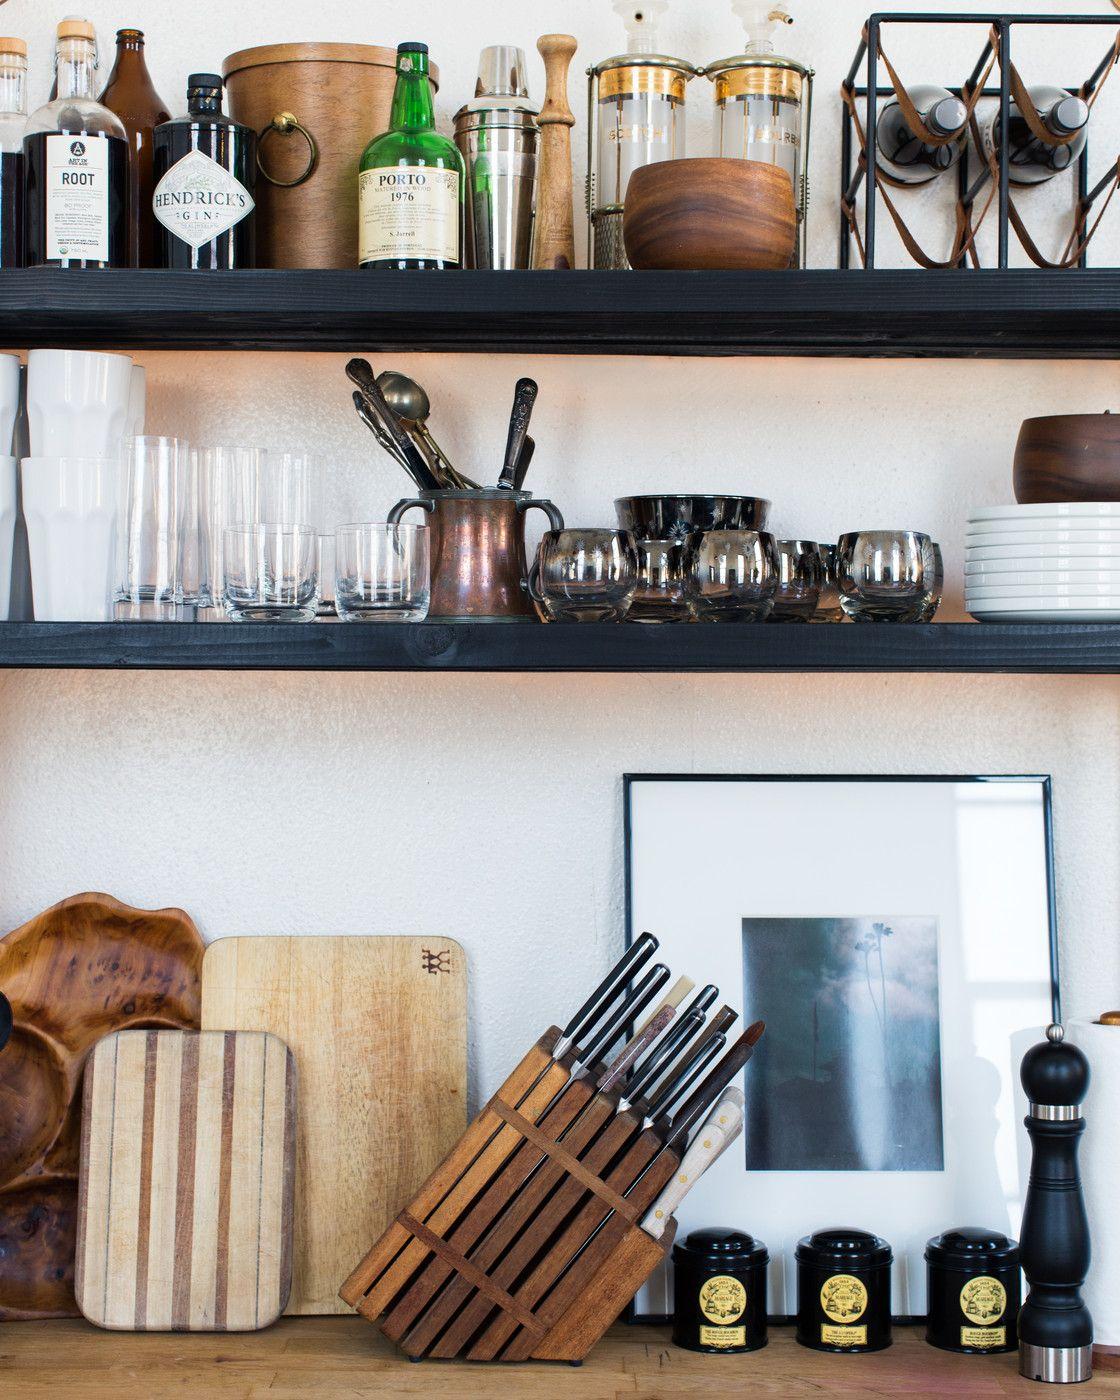 Pin By Reham Hany On Open Shelving: Open Kitchen Shelving, Open